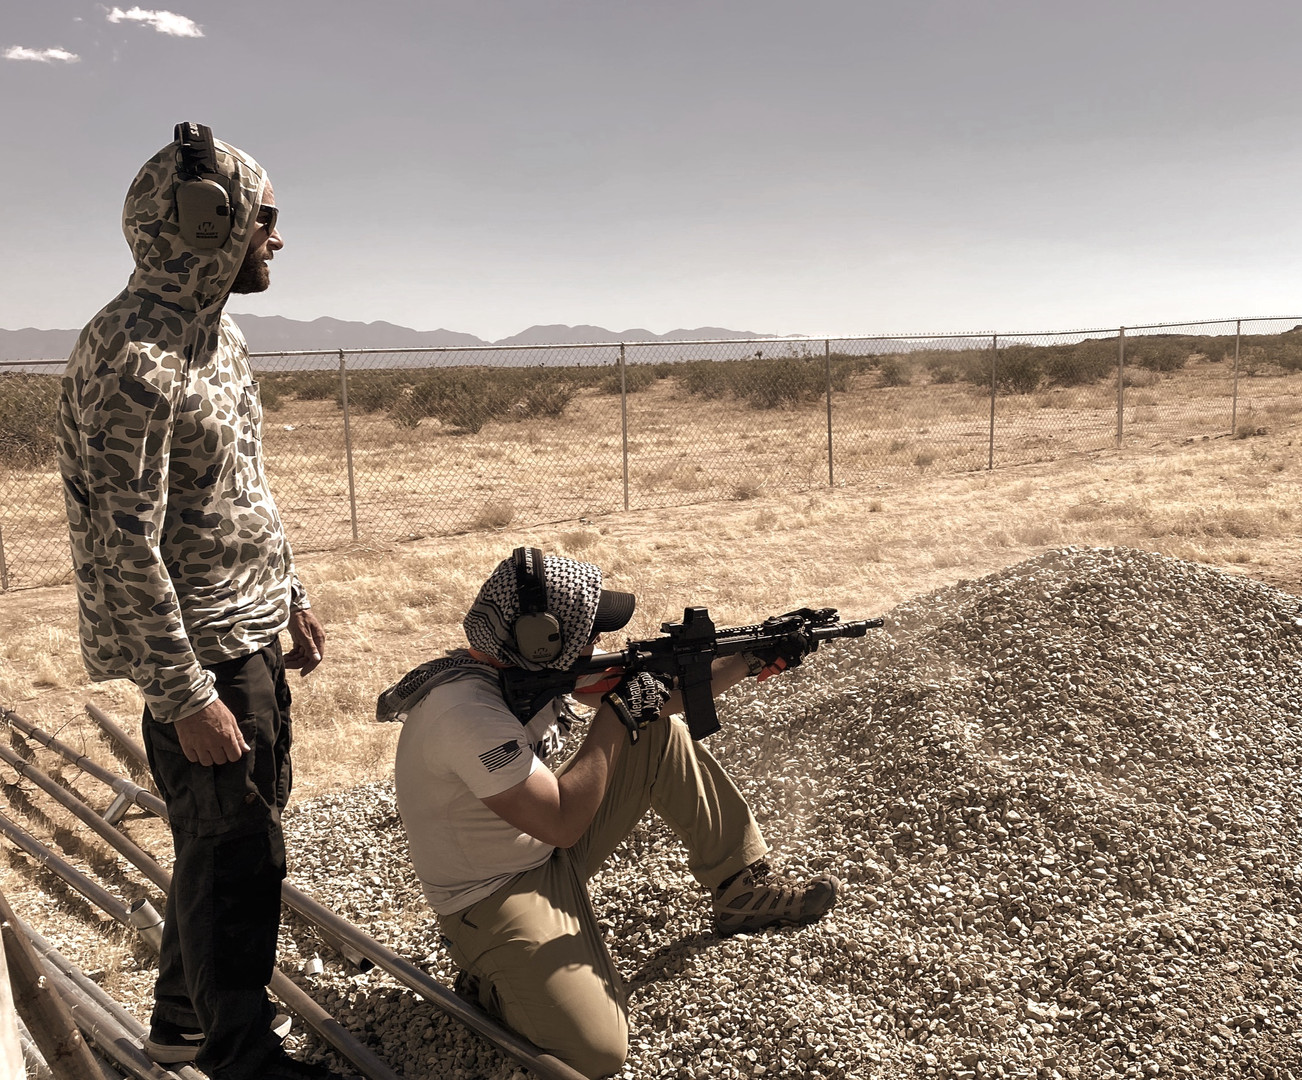 El Mirage Kneeling and Shooting